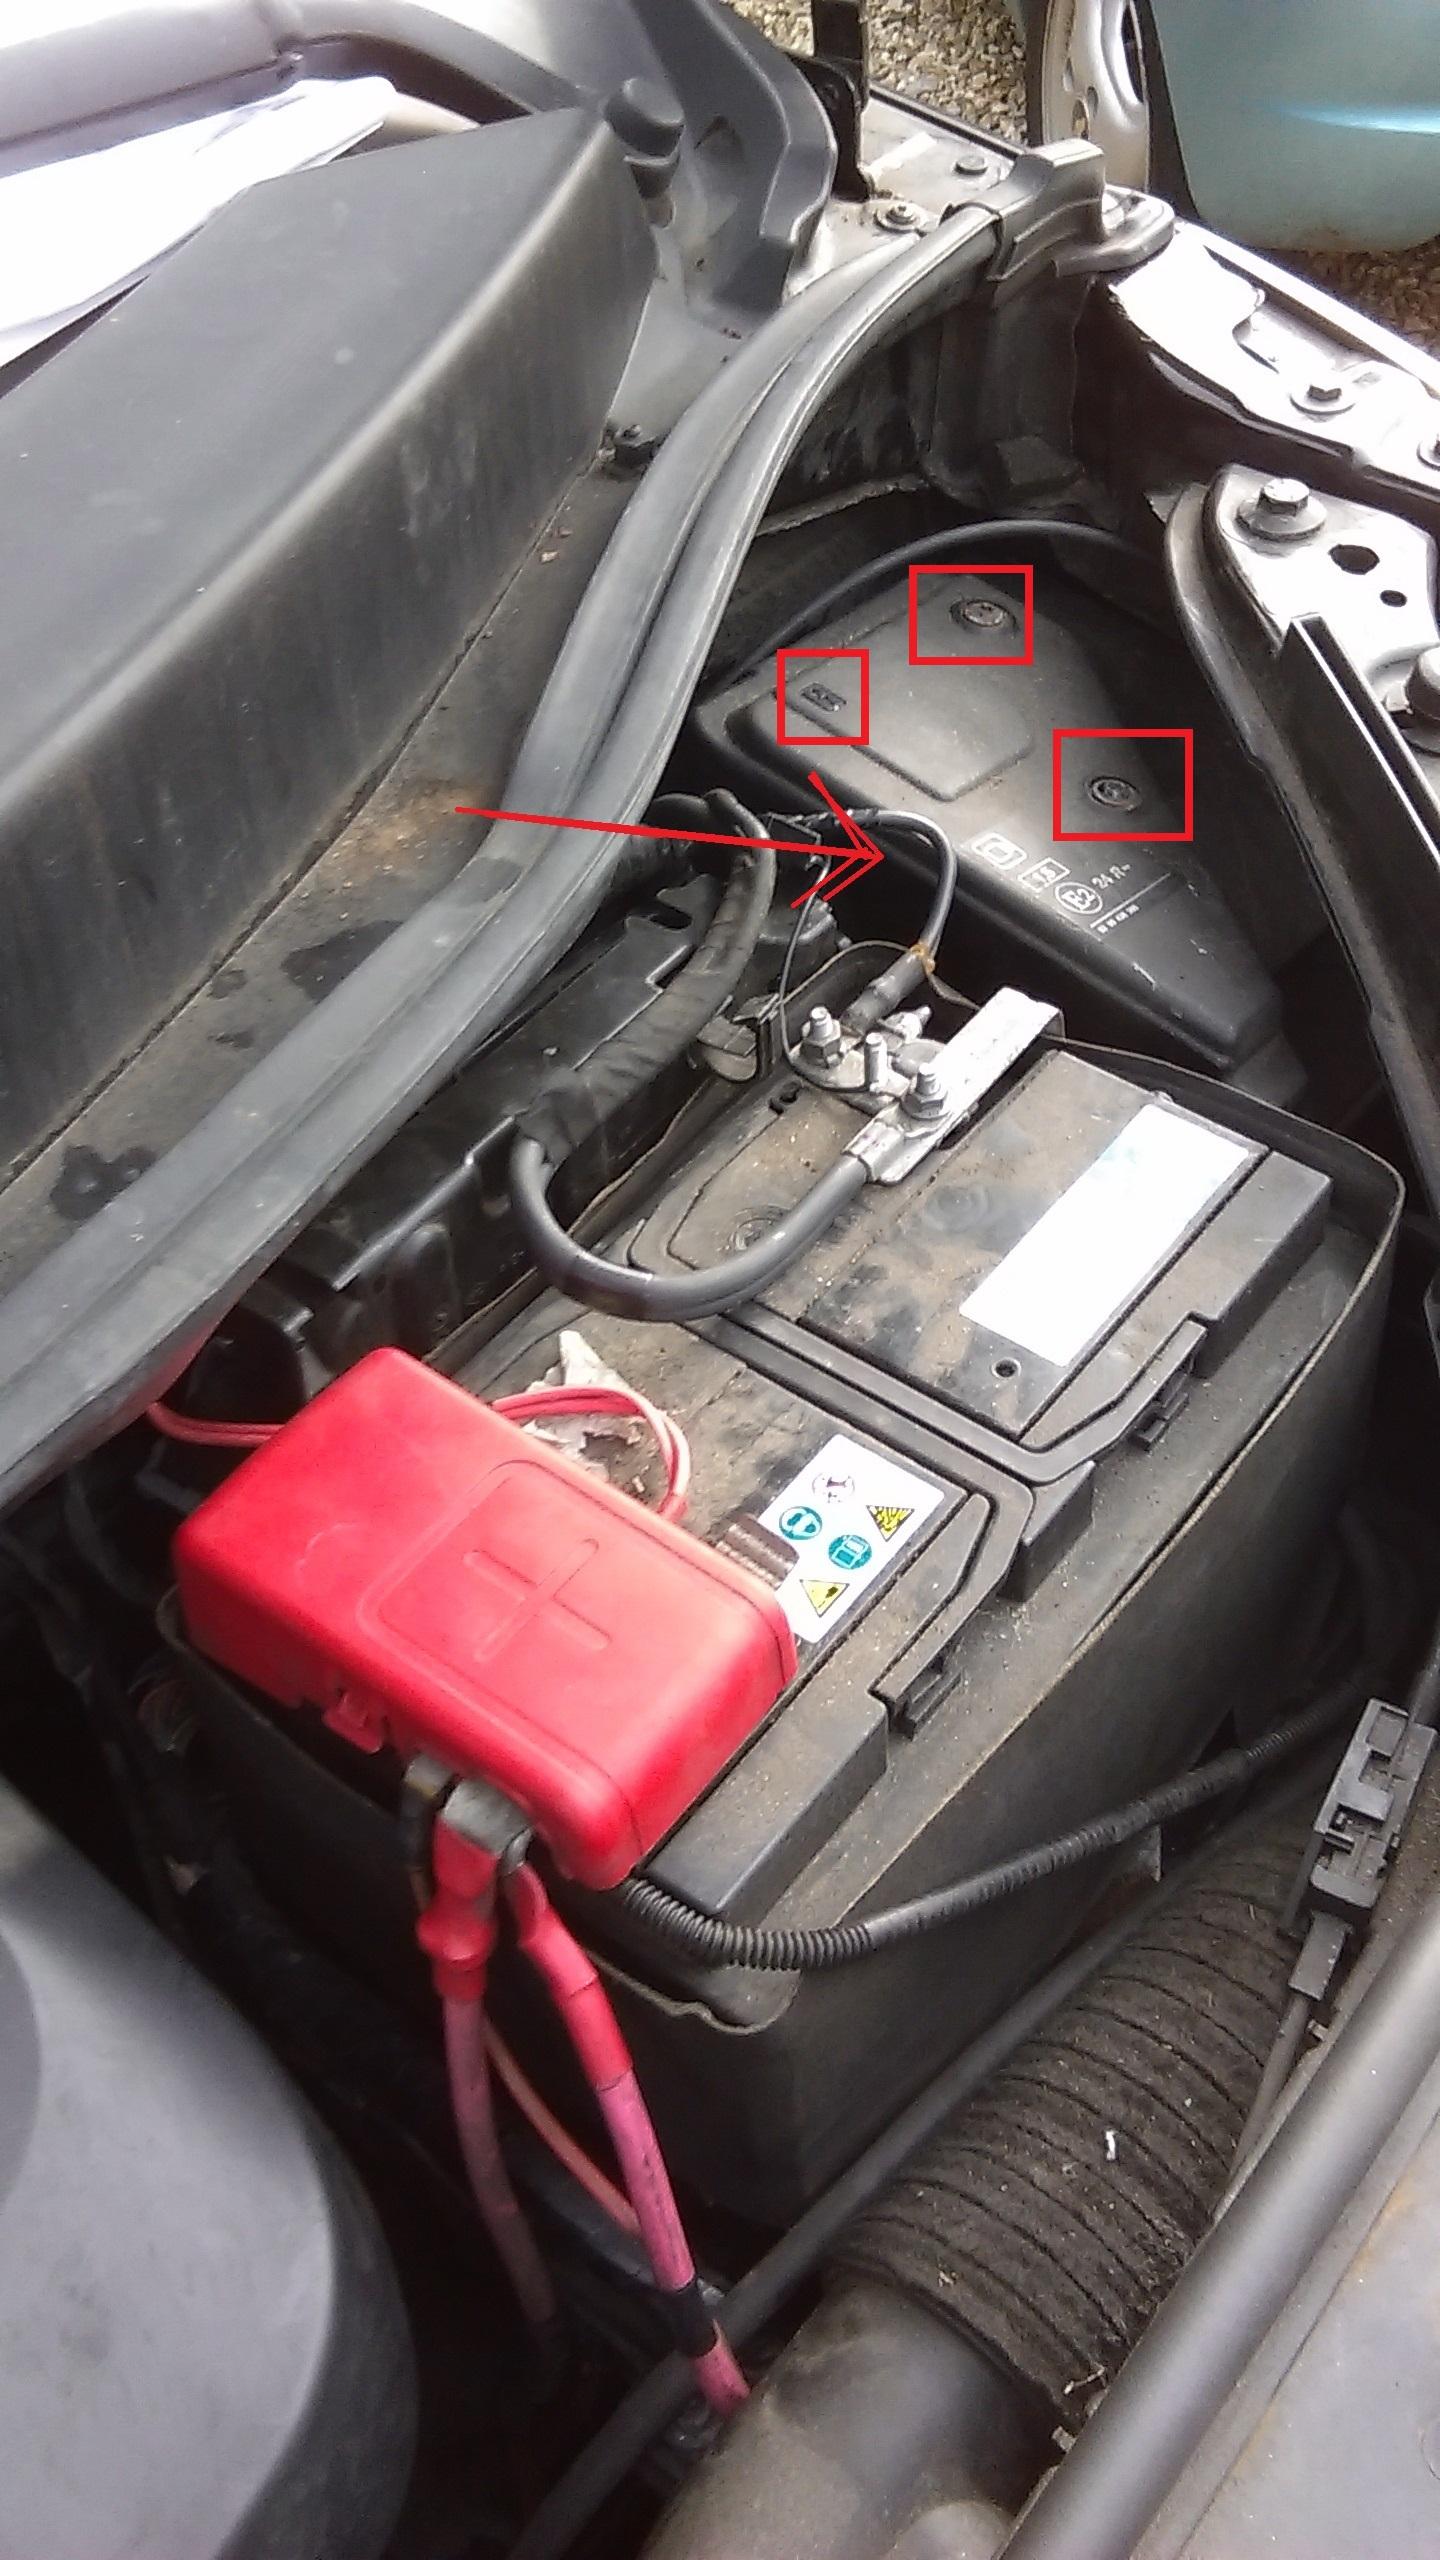 renault grand scenic fuse box location schematic diagramscenic mk1 fuse box  trusted wiring diagram online renault